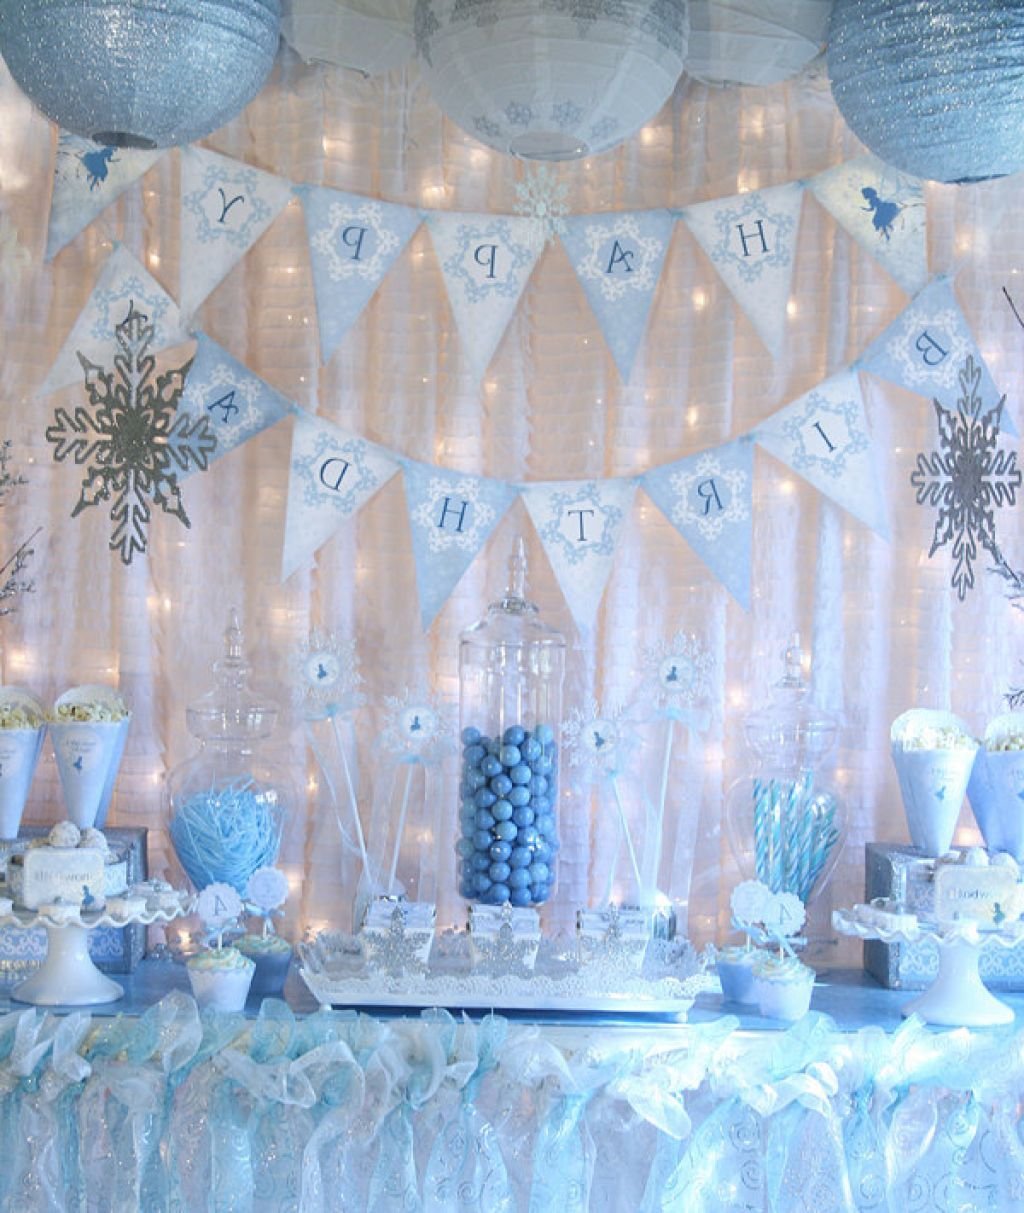 Winter Wonderland Themed Party Decoration Ideas Part - 18: Frozen Party Decoration Ideas - Google Search